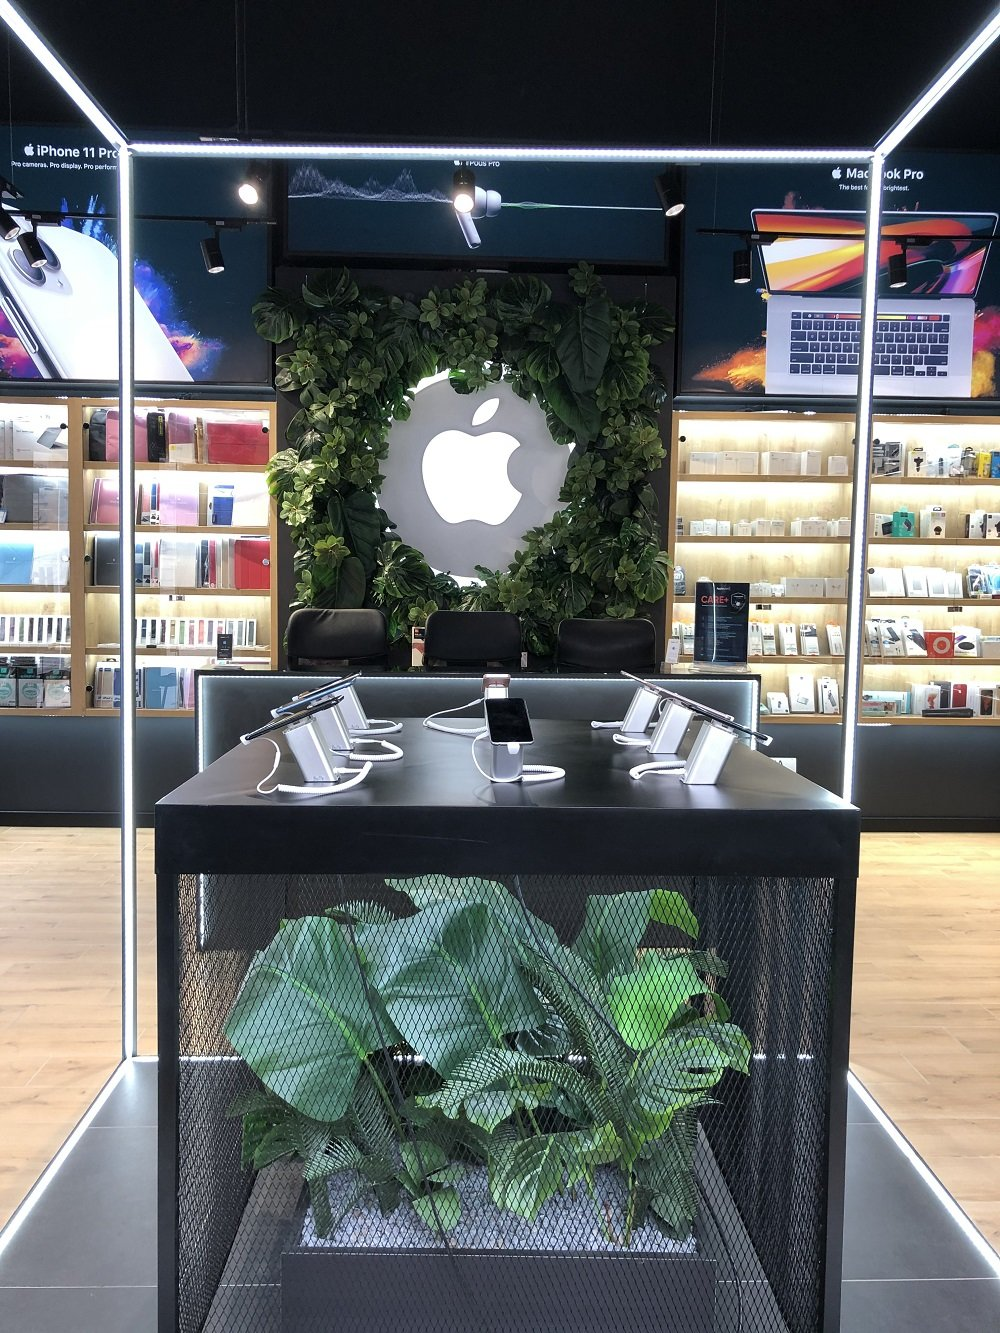 iPhone SE 2020 – найдешевший смартфон Apple вже в Apple Room, фото-6